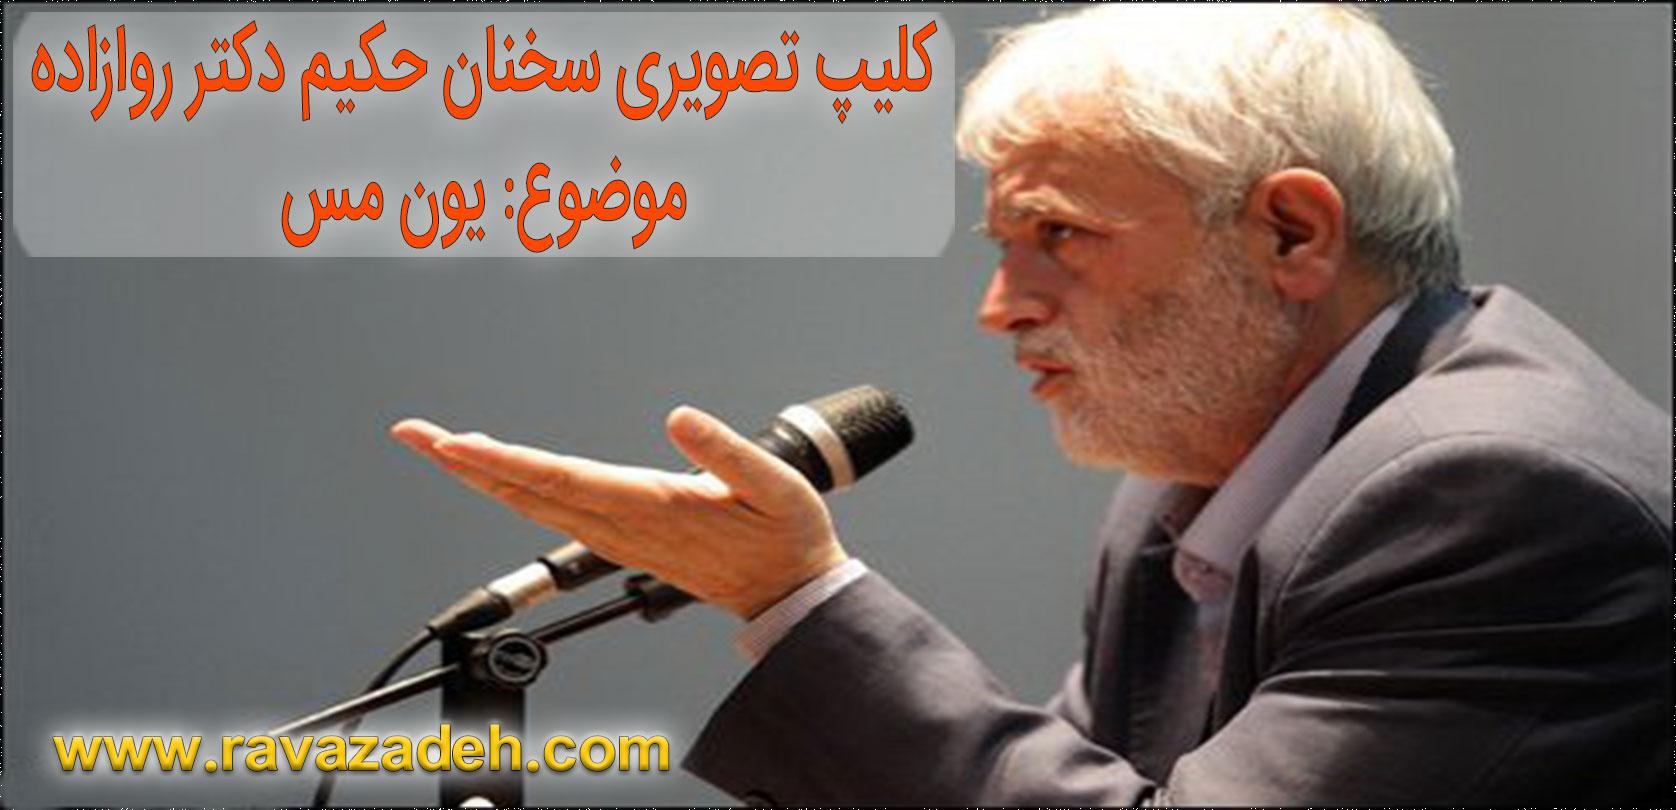 Photo of لزوم و اهمیت یون مس در بدن + کلیپ تصویری سخنرانی حکیم دکتر روازاده